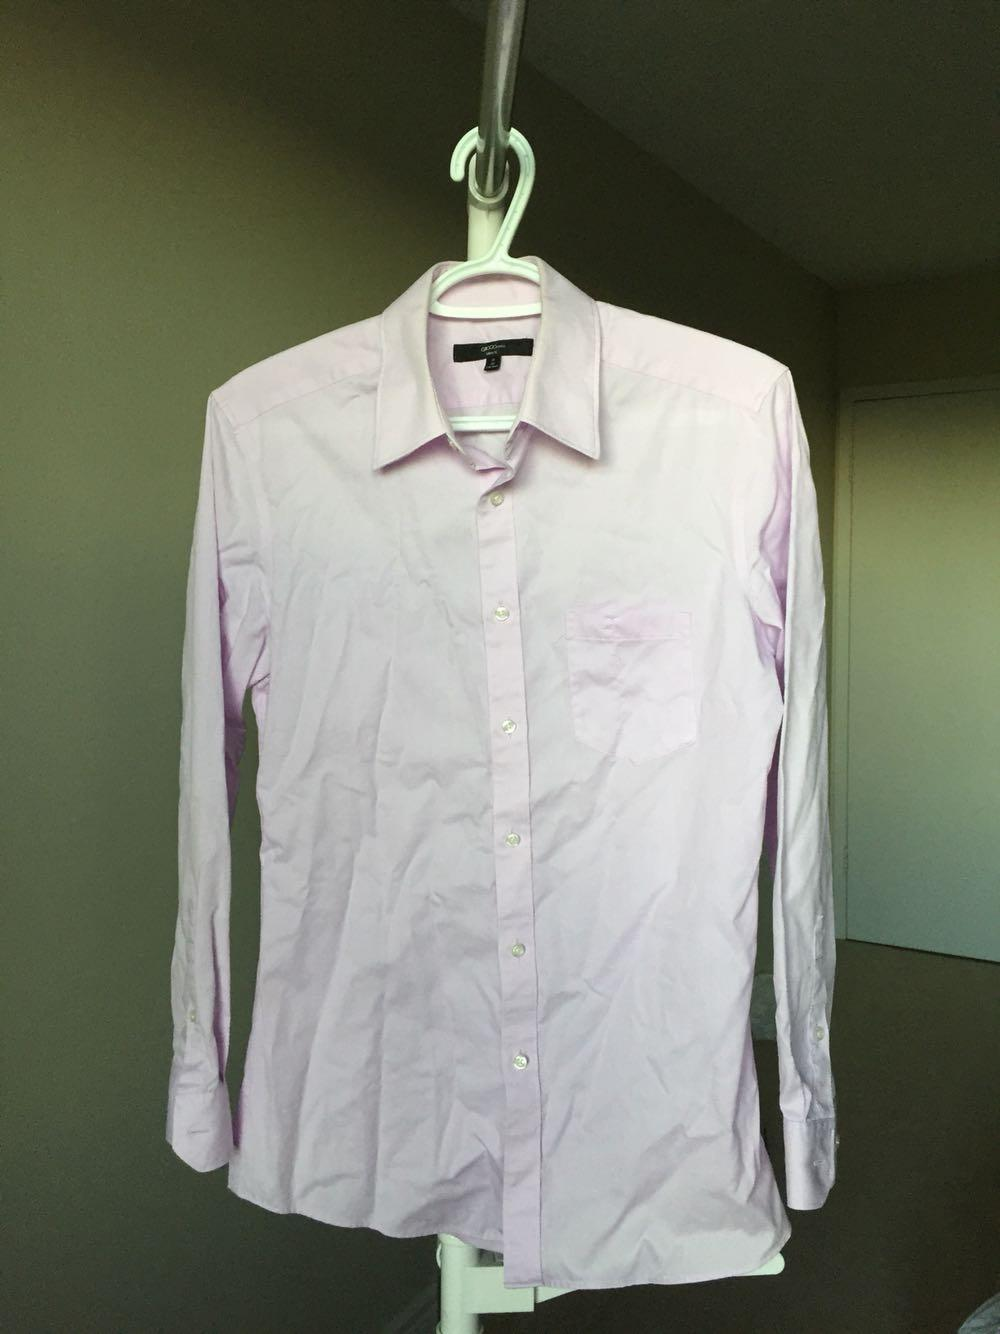 Best G2000 Mens Slim Fit Light Purple Dress Shirt 1532 For Sale